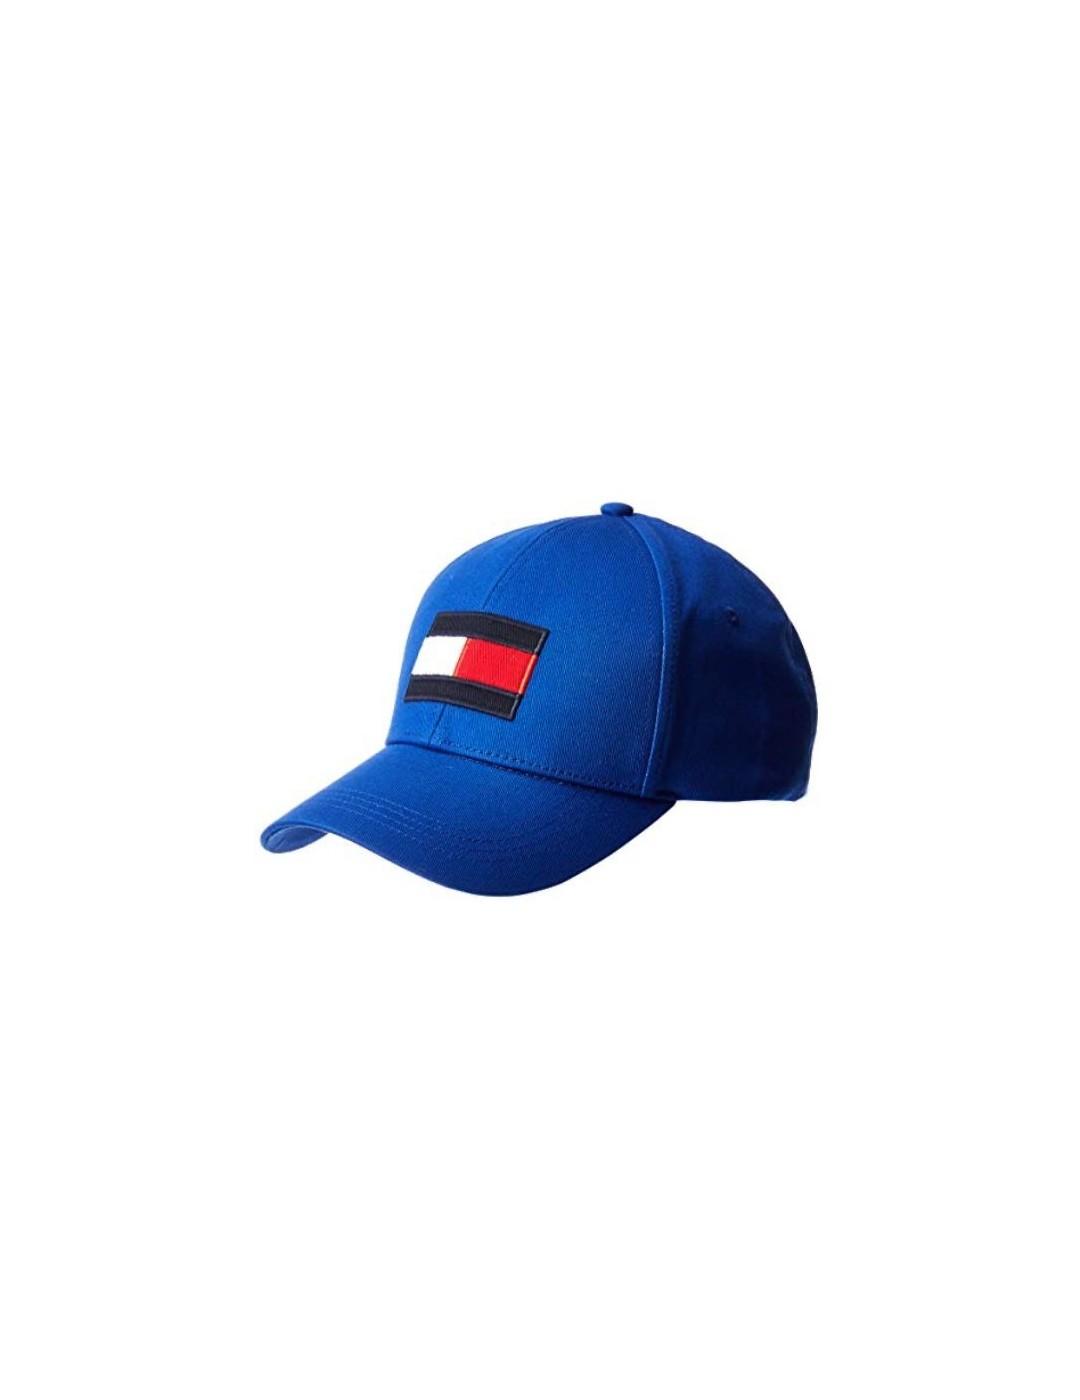 GORRA TOMMY JEANS BIG FLAG CAP BLUE